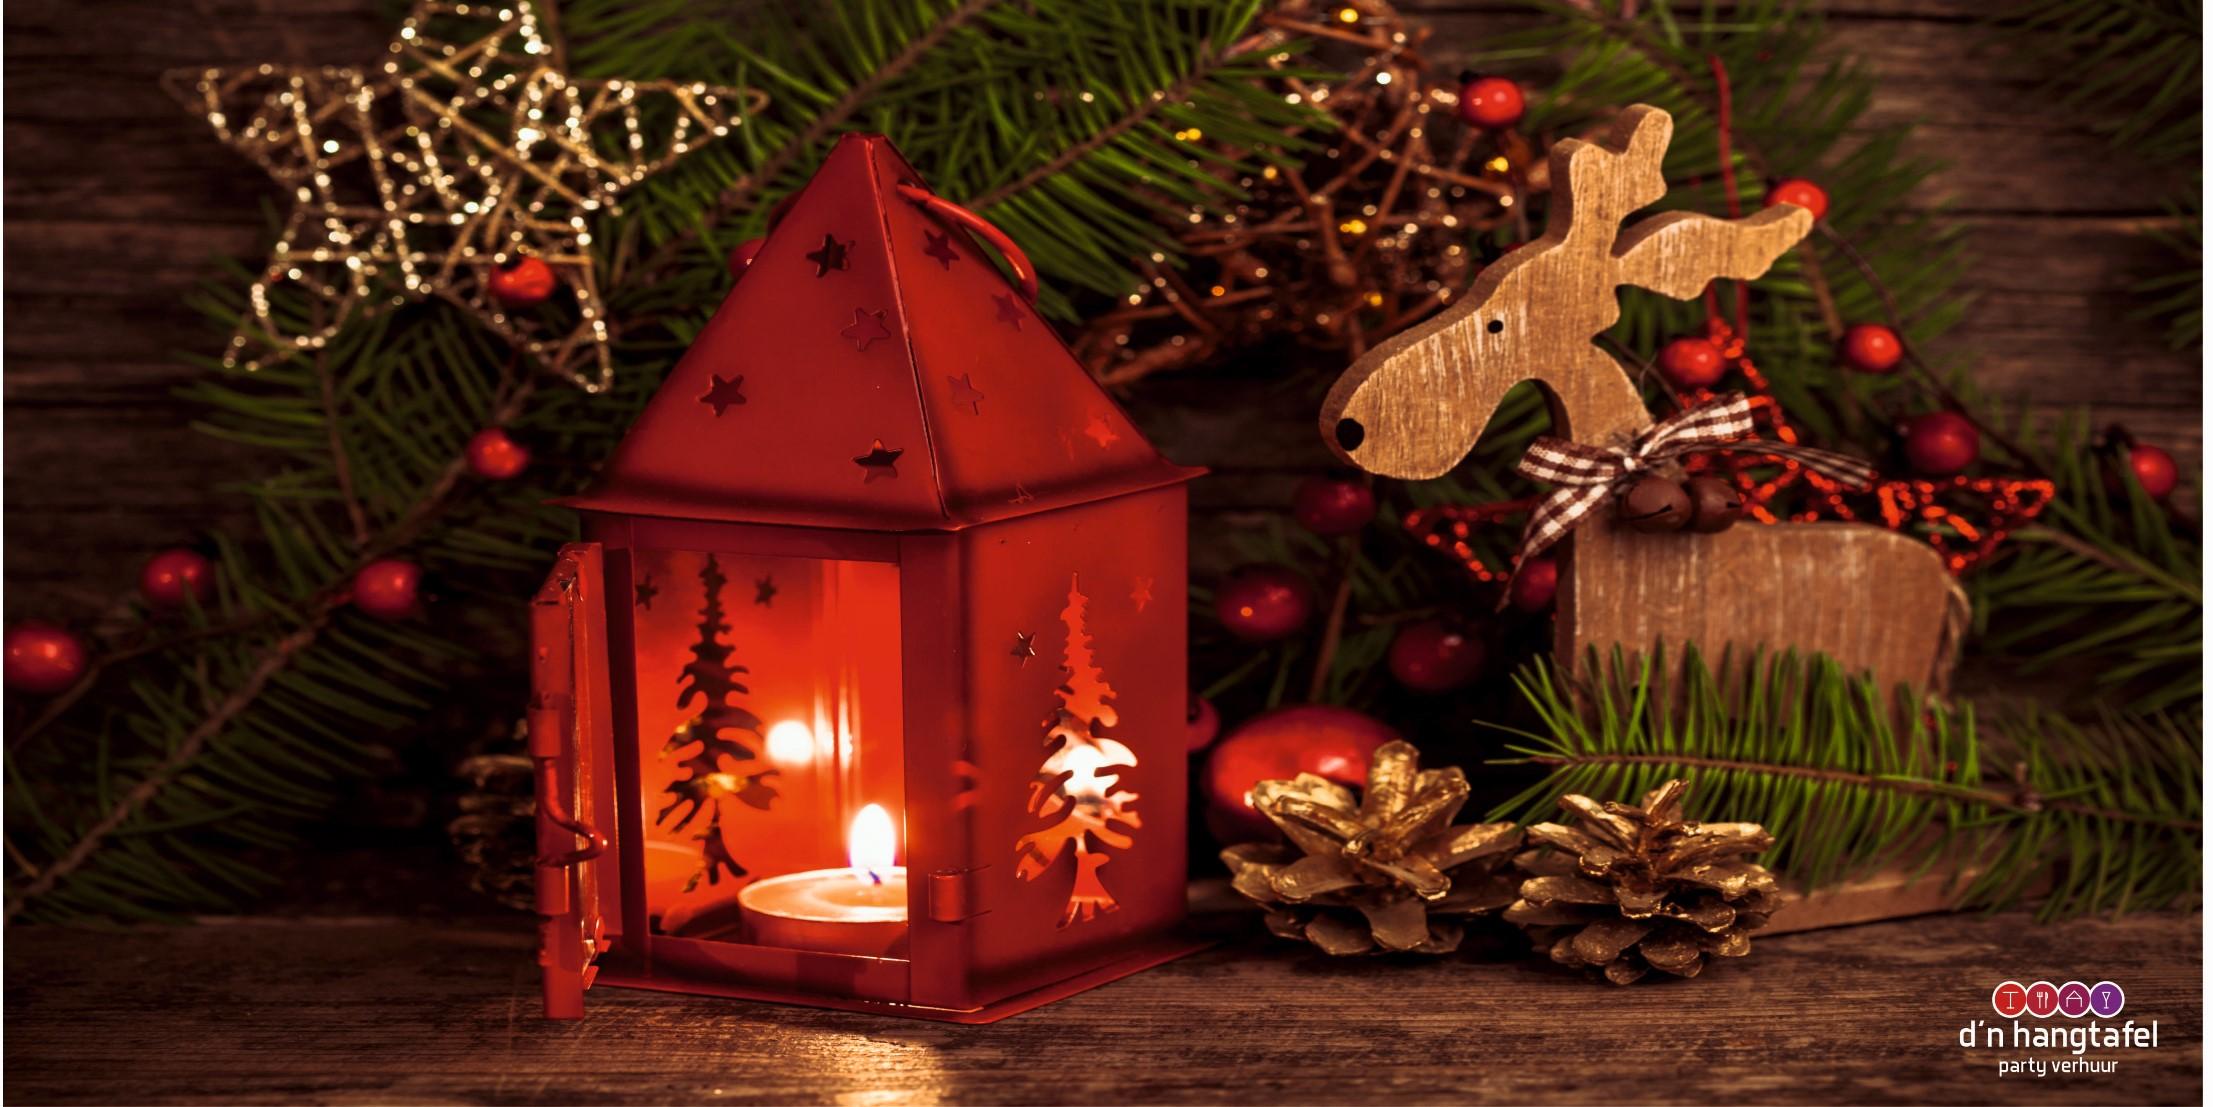 Bouwhek met kerst thema doek (lantaarn met versiering